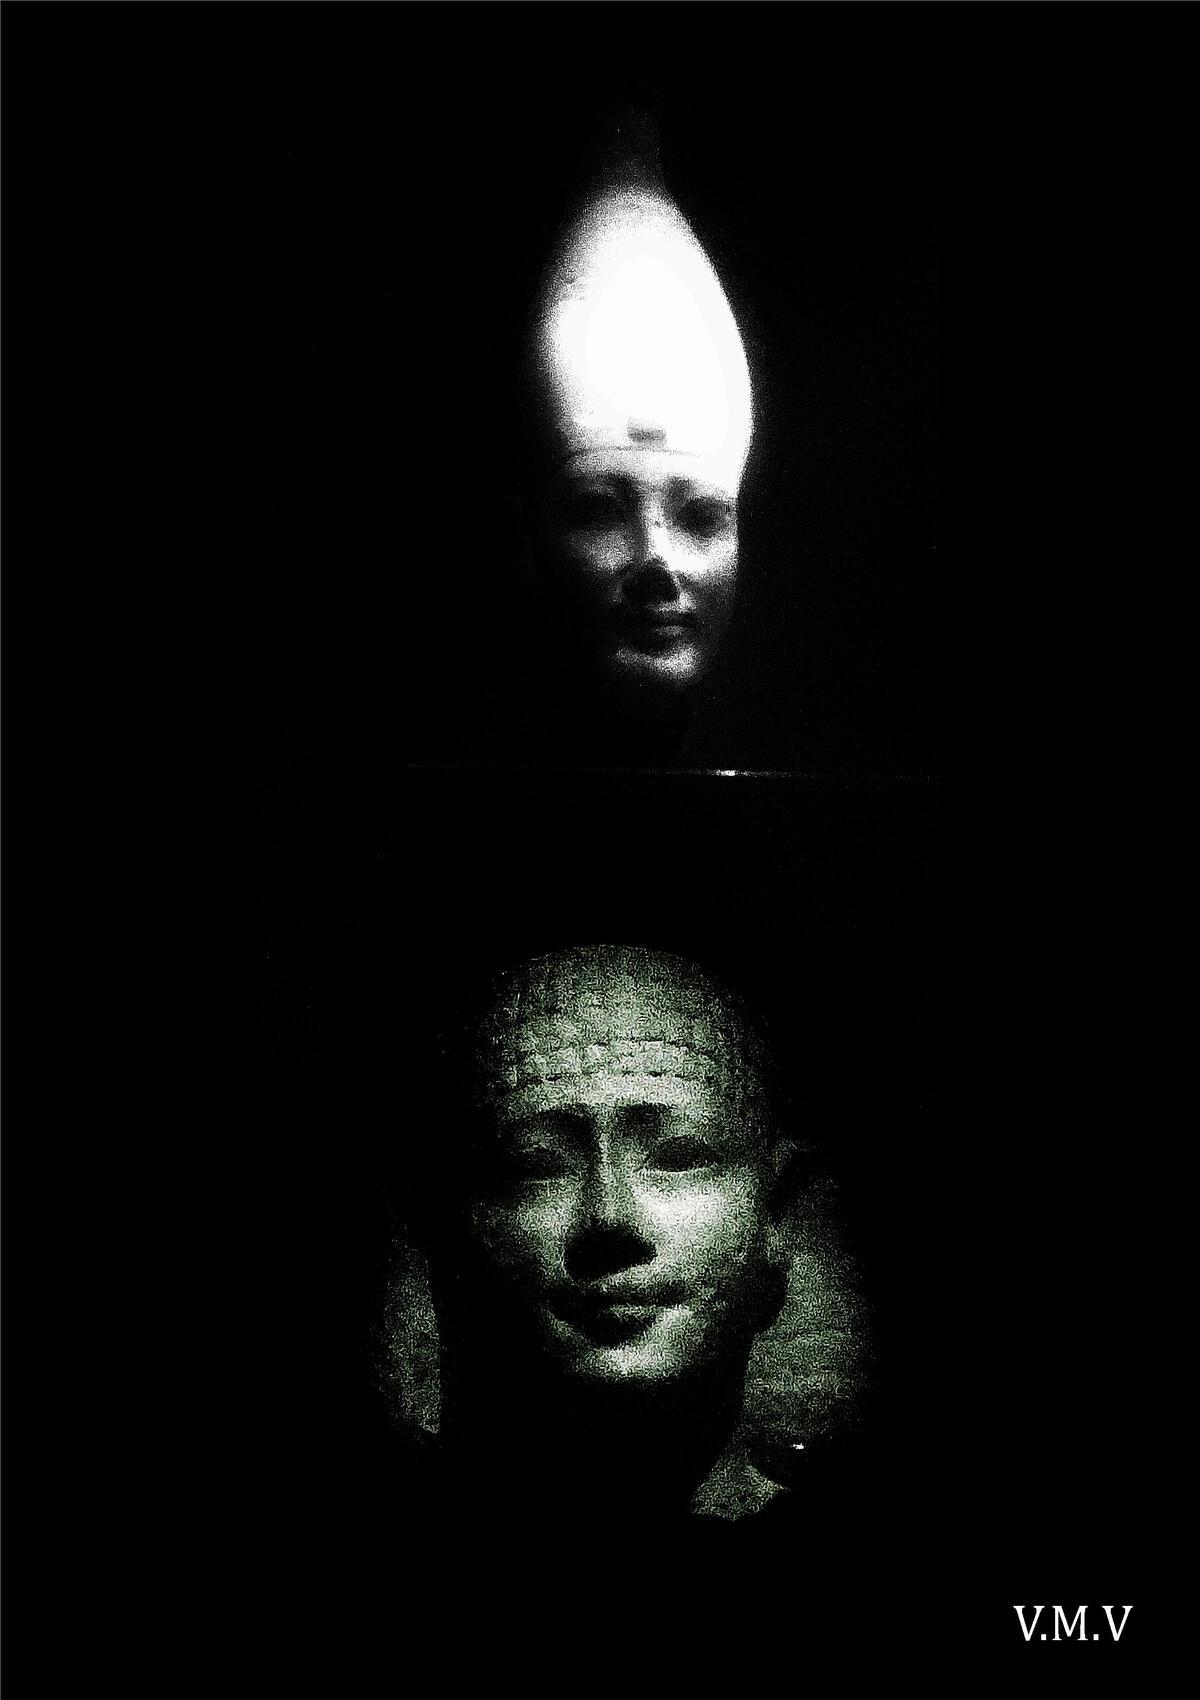 """Visages égyptiens"" de Vanessa Martinez Volterra"